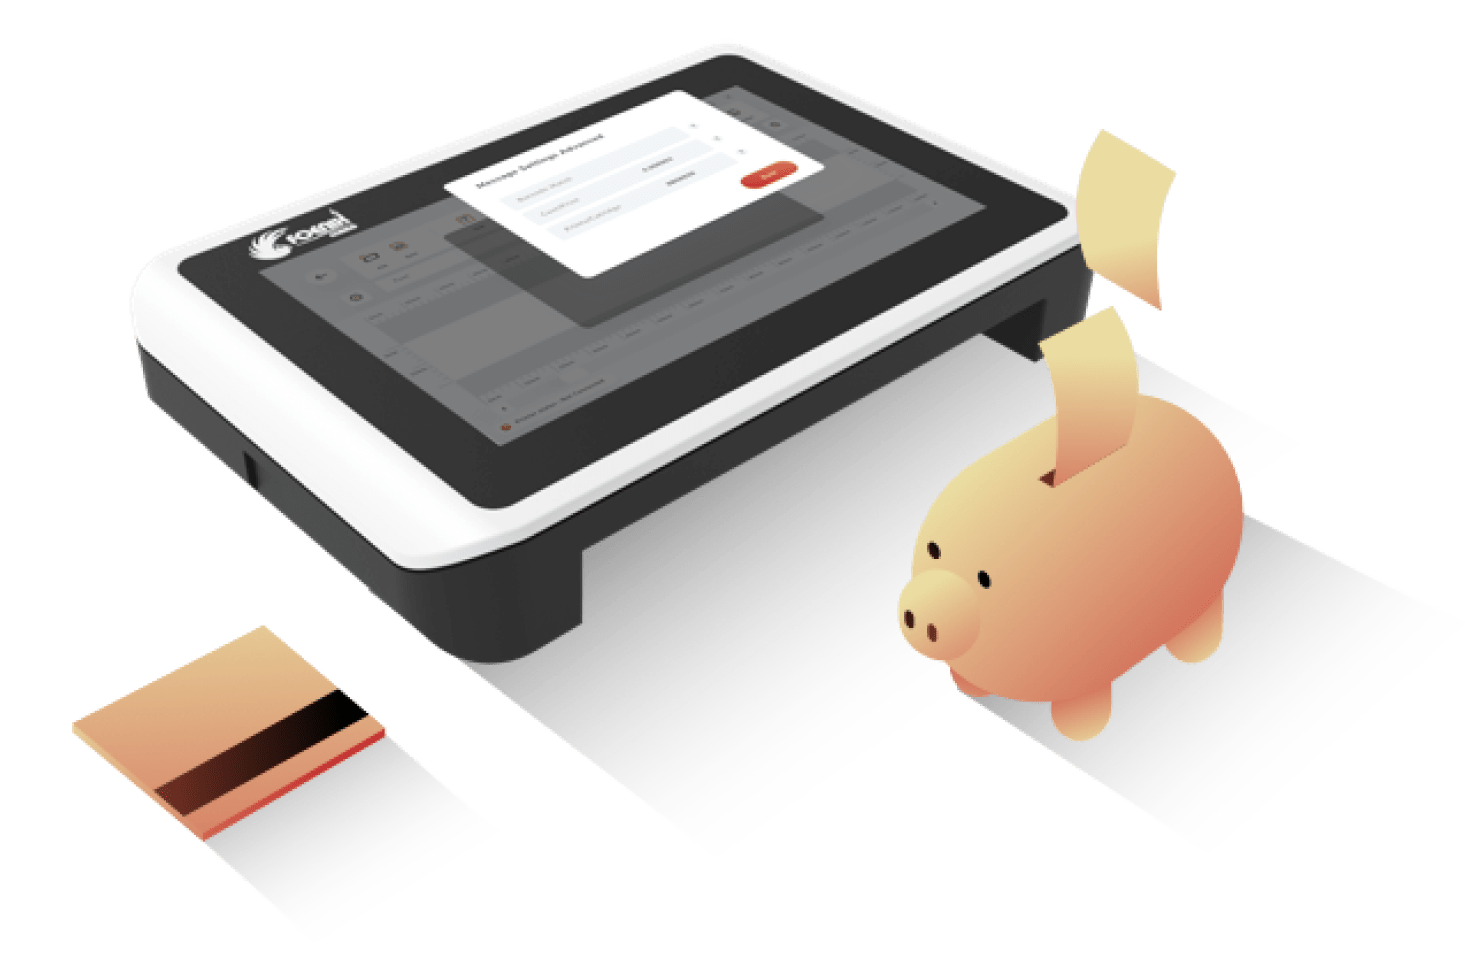 FXONE printer costs